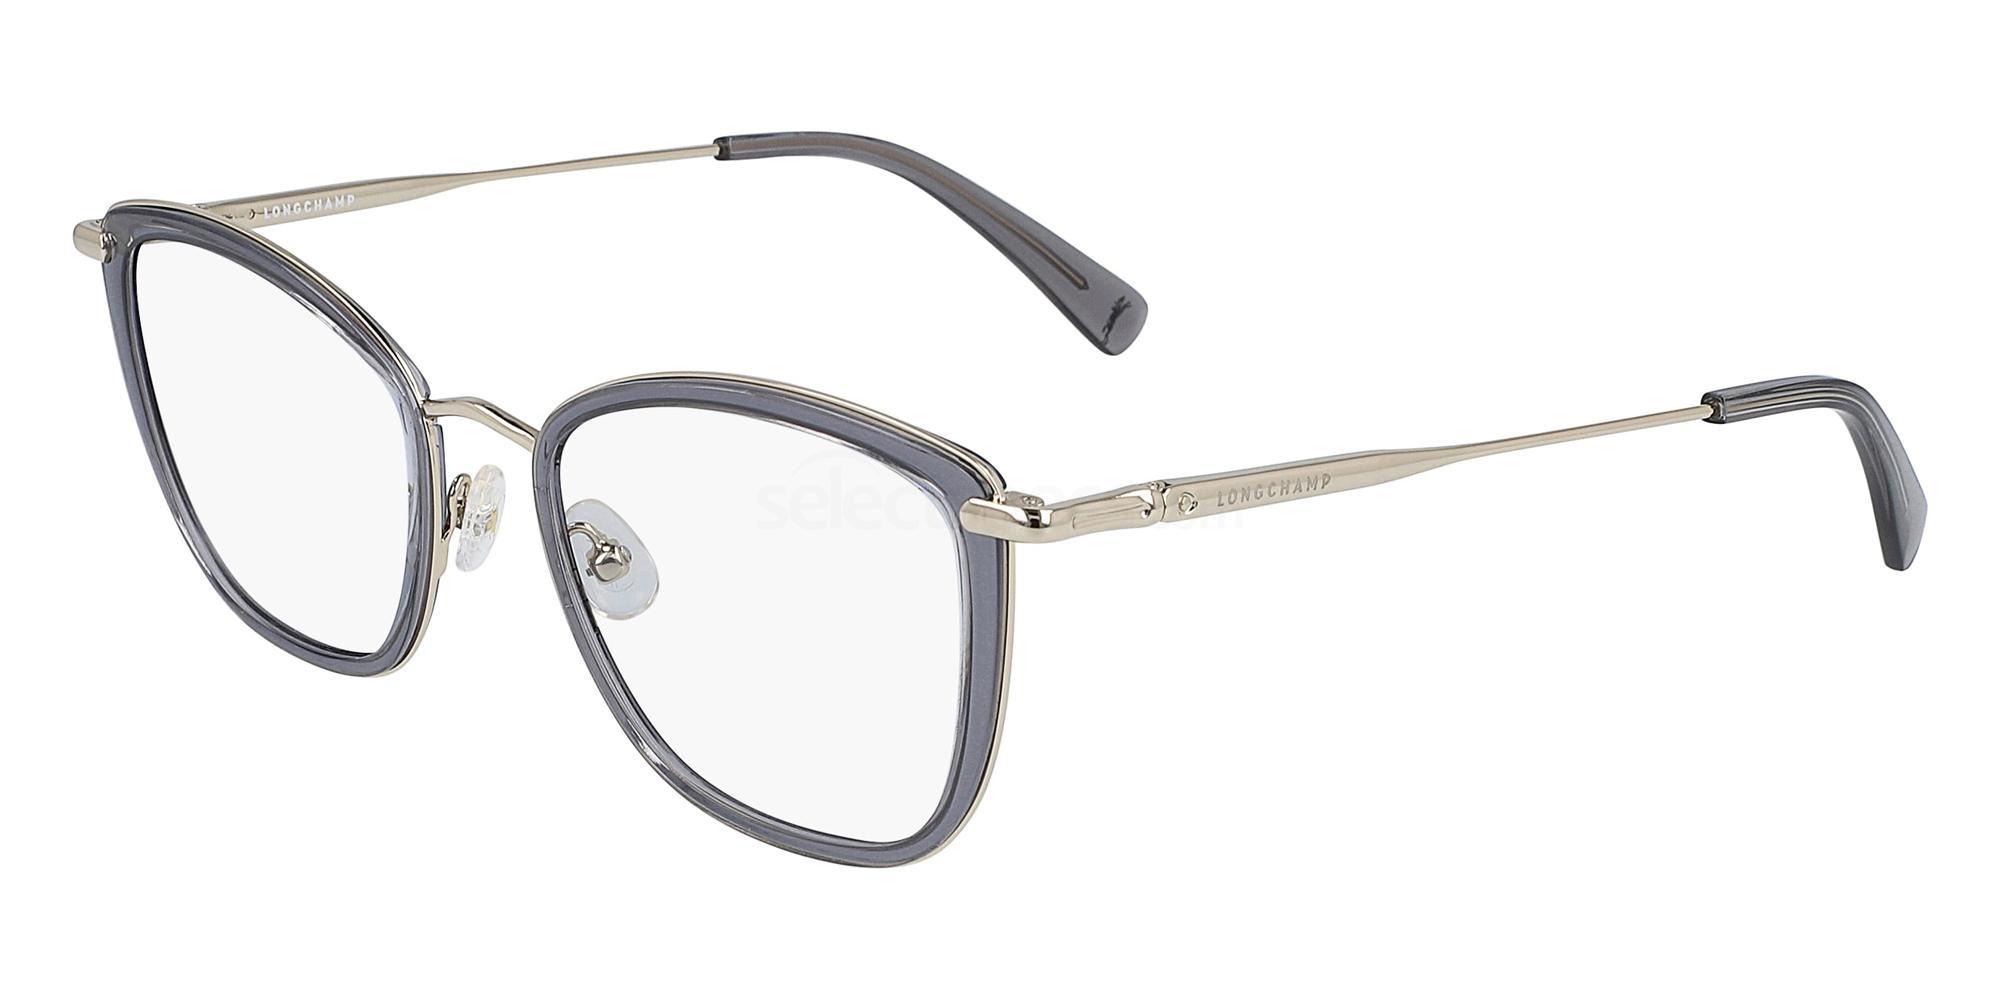 035 LO2660 Glasses, LONGCHAMP